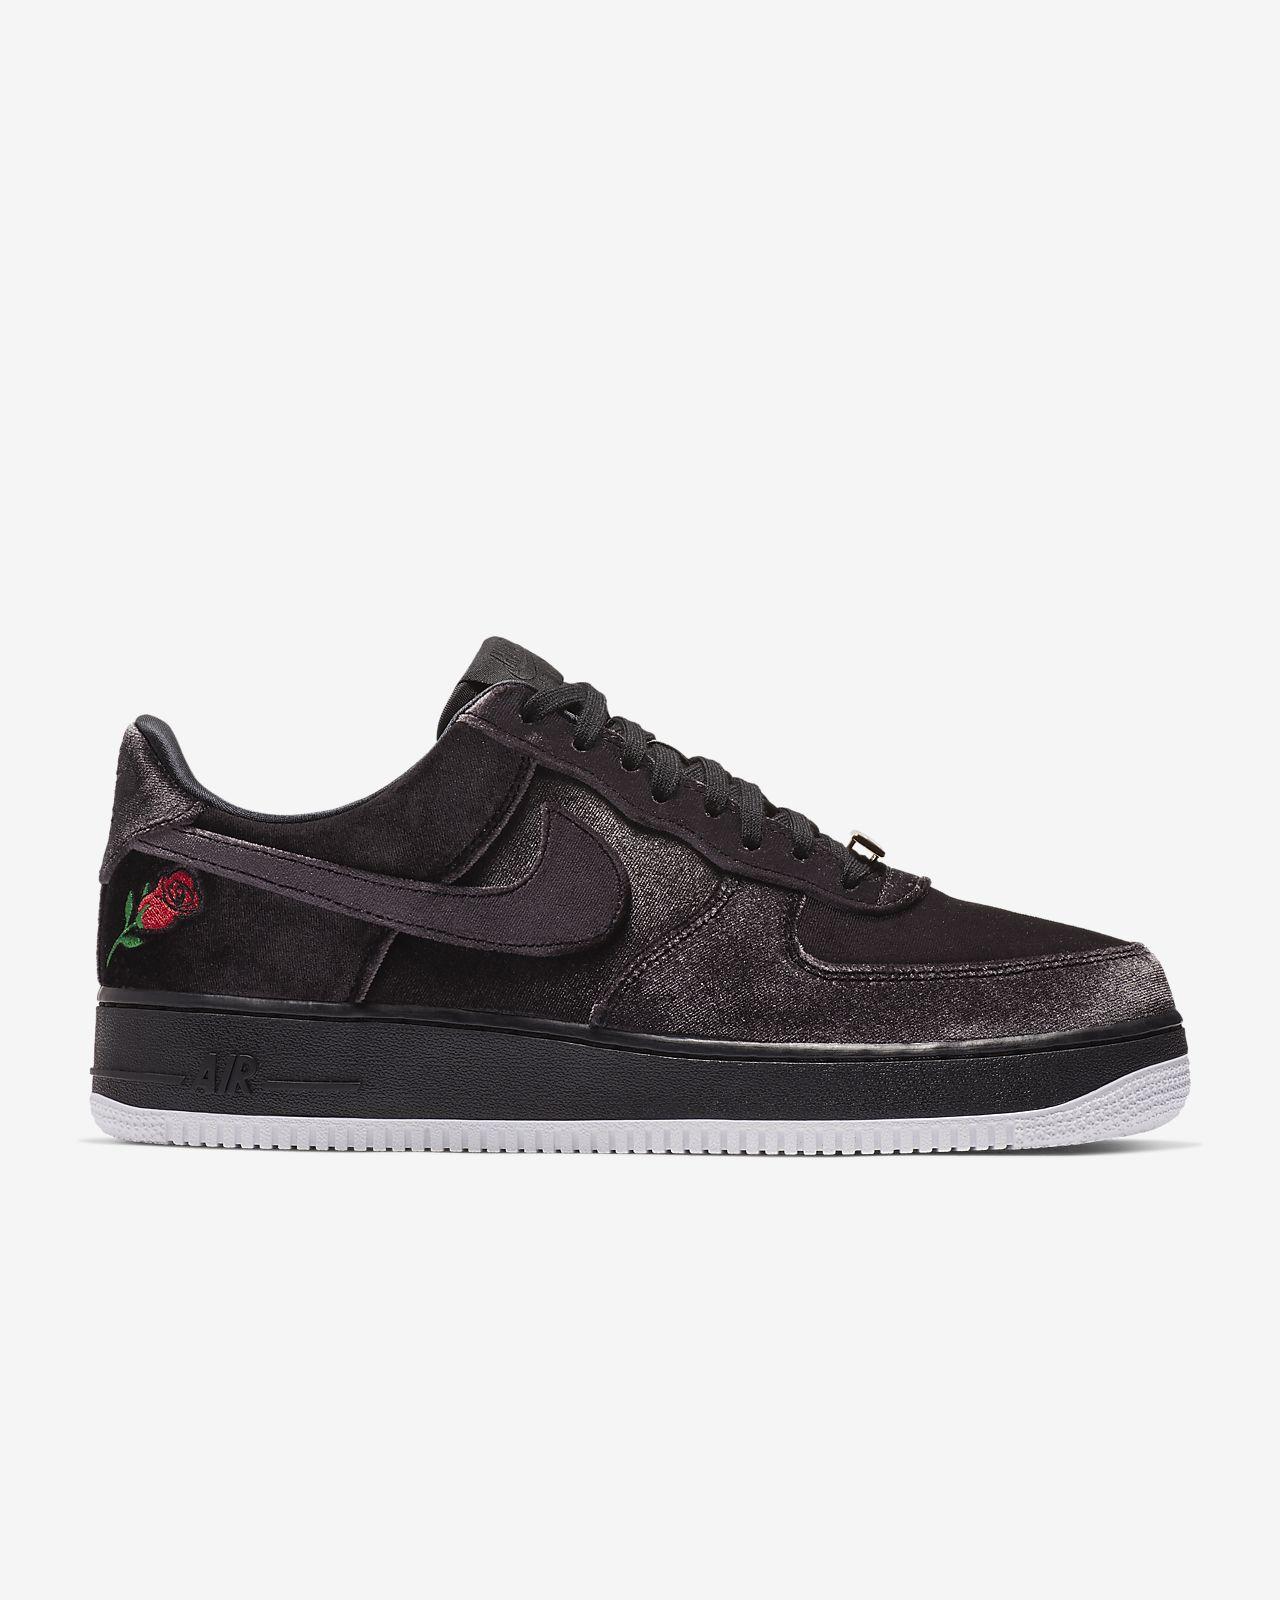 hot sale online 325e7 ff035 ... Sko Nike Air Force 1  07 för män